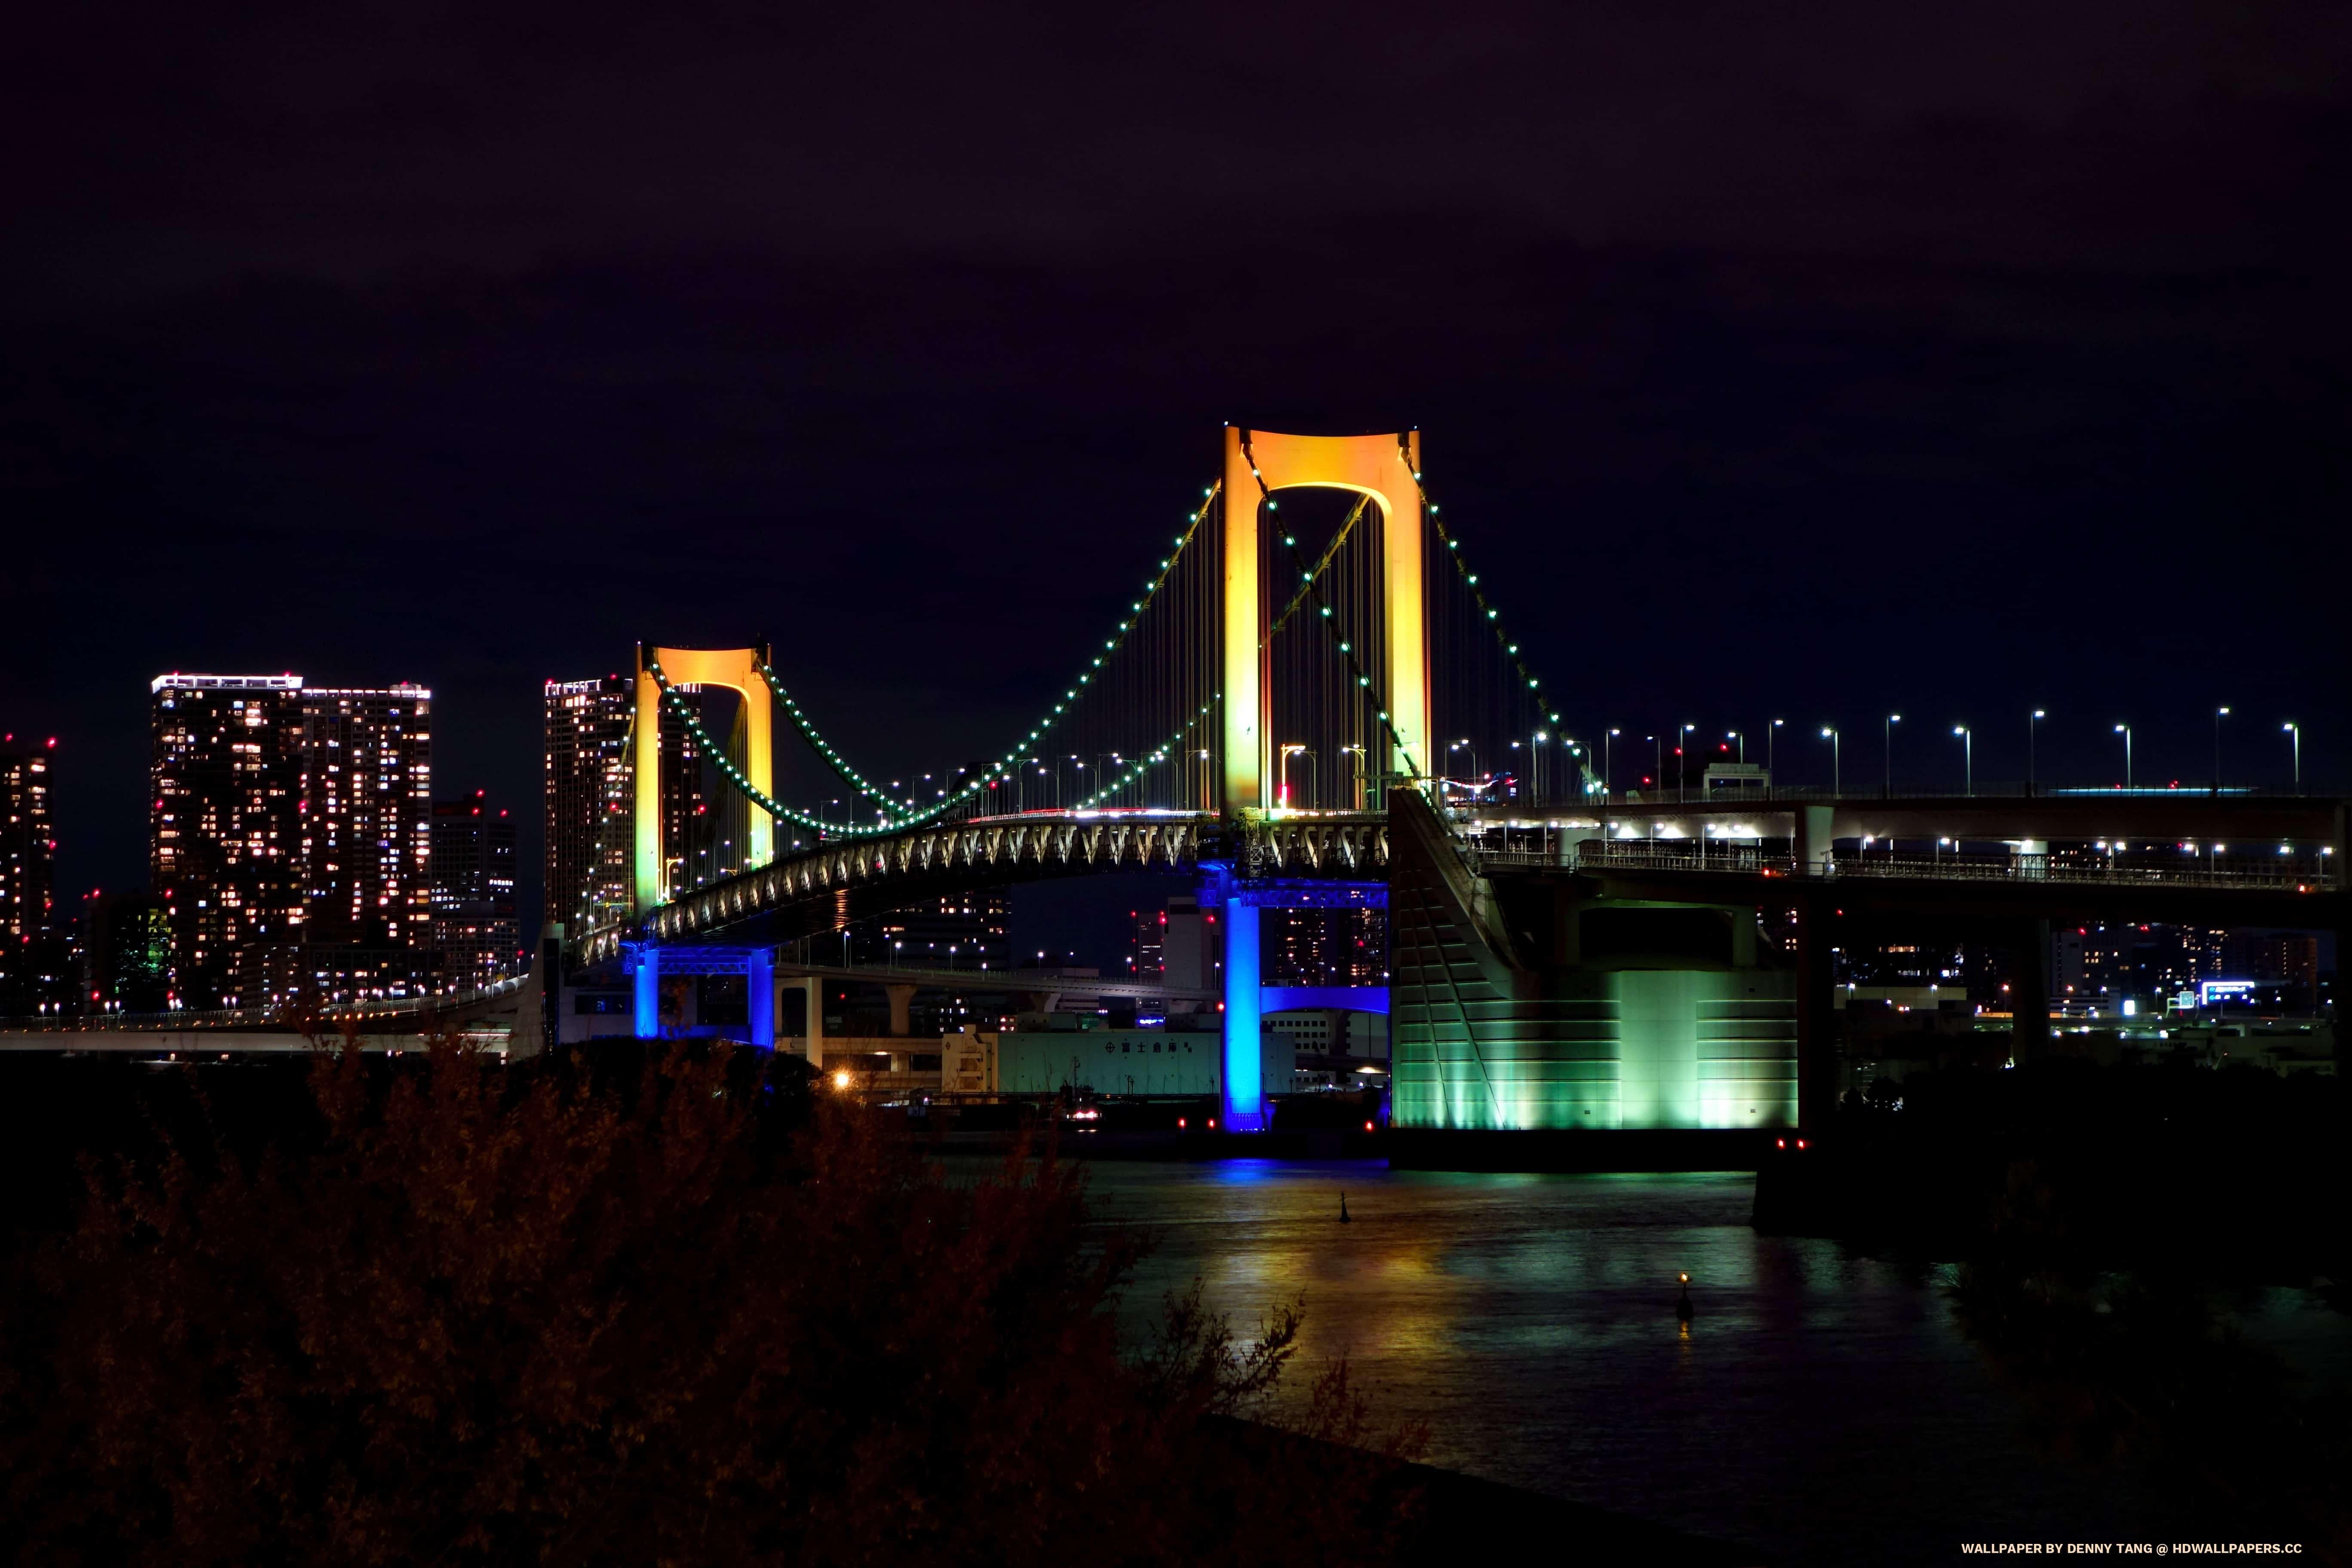 Niagara Falls Hd 1080p Wallpapers Rainbow Suspension Bridge In Tokyo Hd Wallpapers